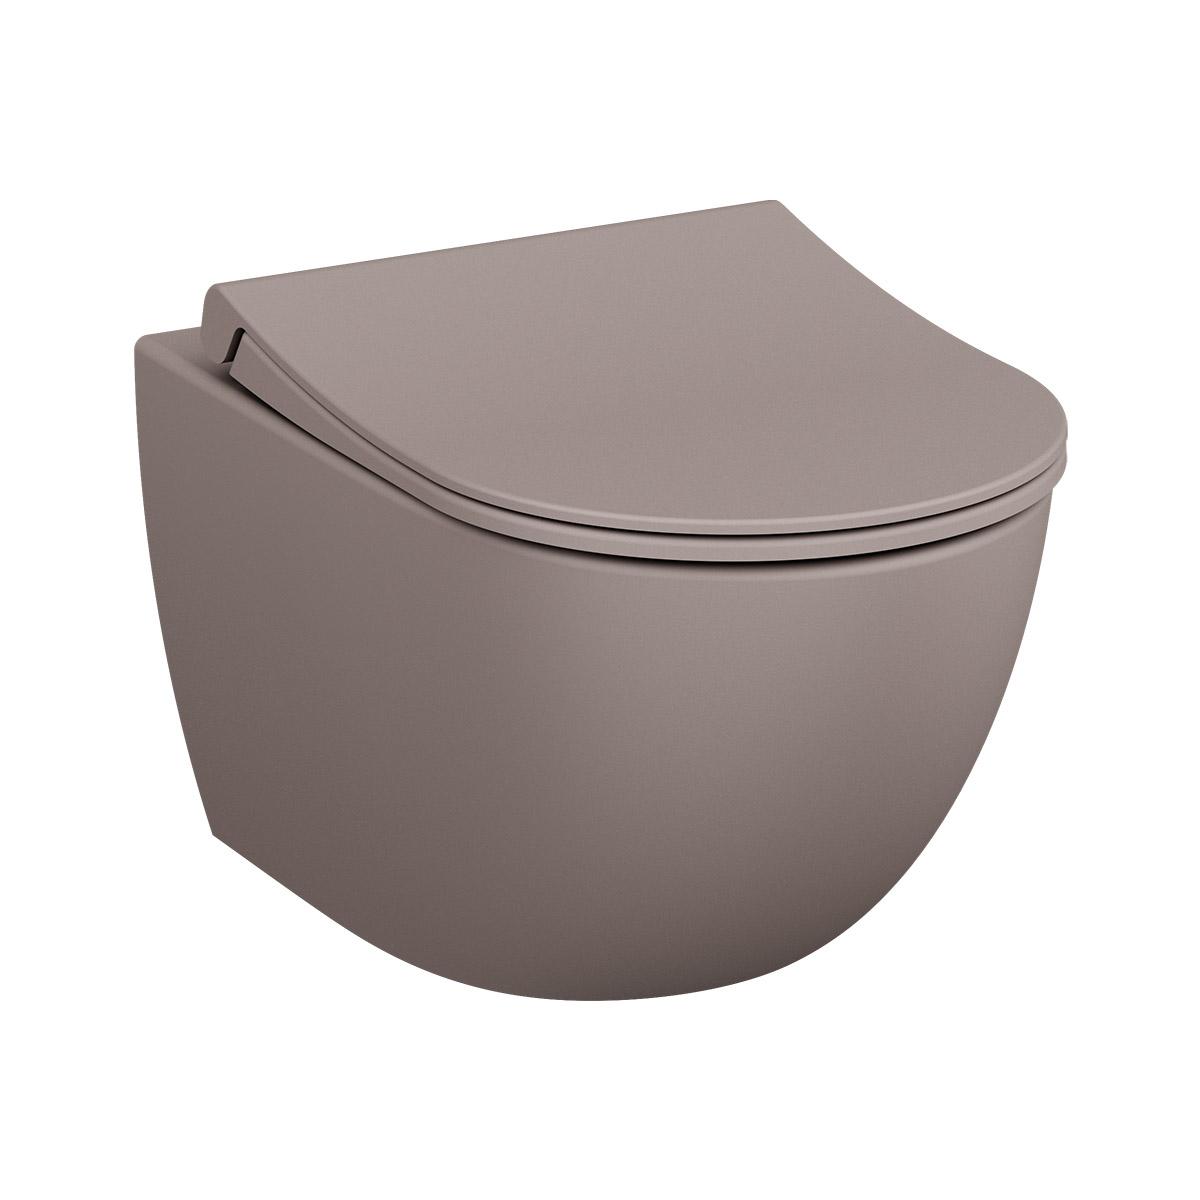 Sento Wand-WC VitrA Flush 2.0 mit Bidetfunktion, Nerz Matt